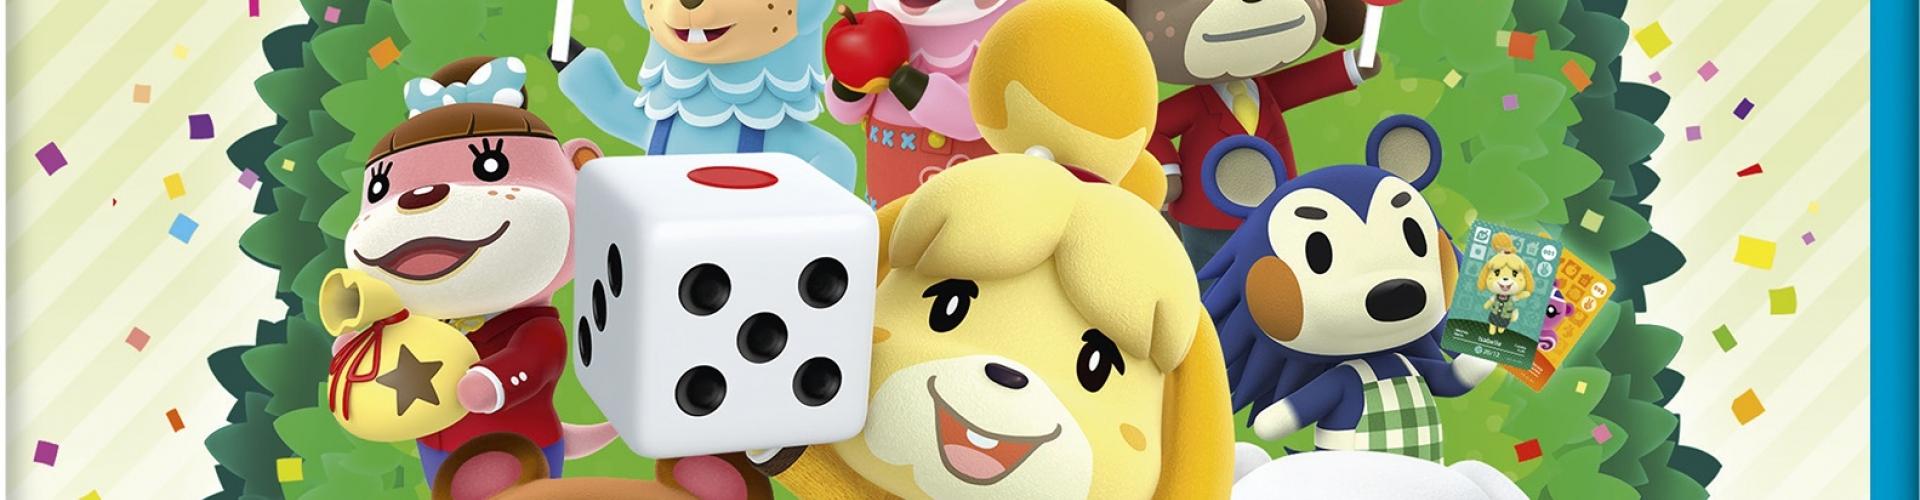 Animal Crossing im Test Happy Home Designer   Tine Wittler kann ...